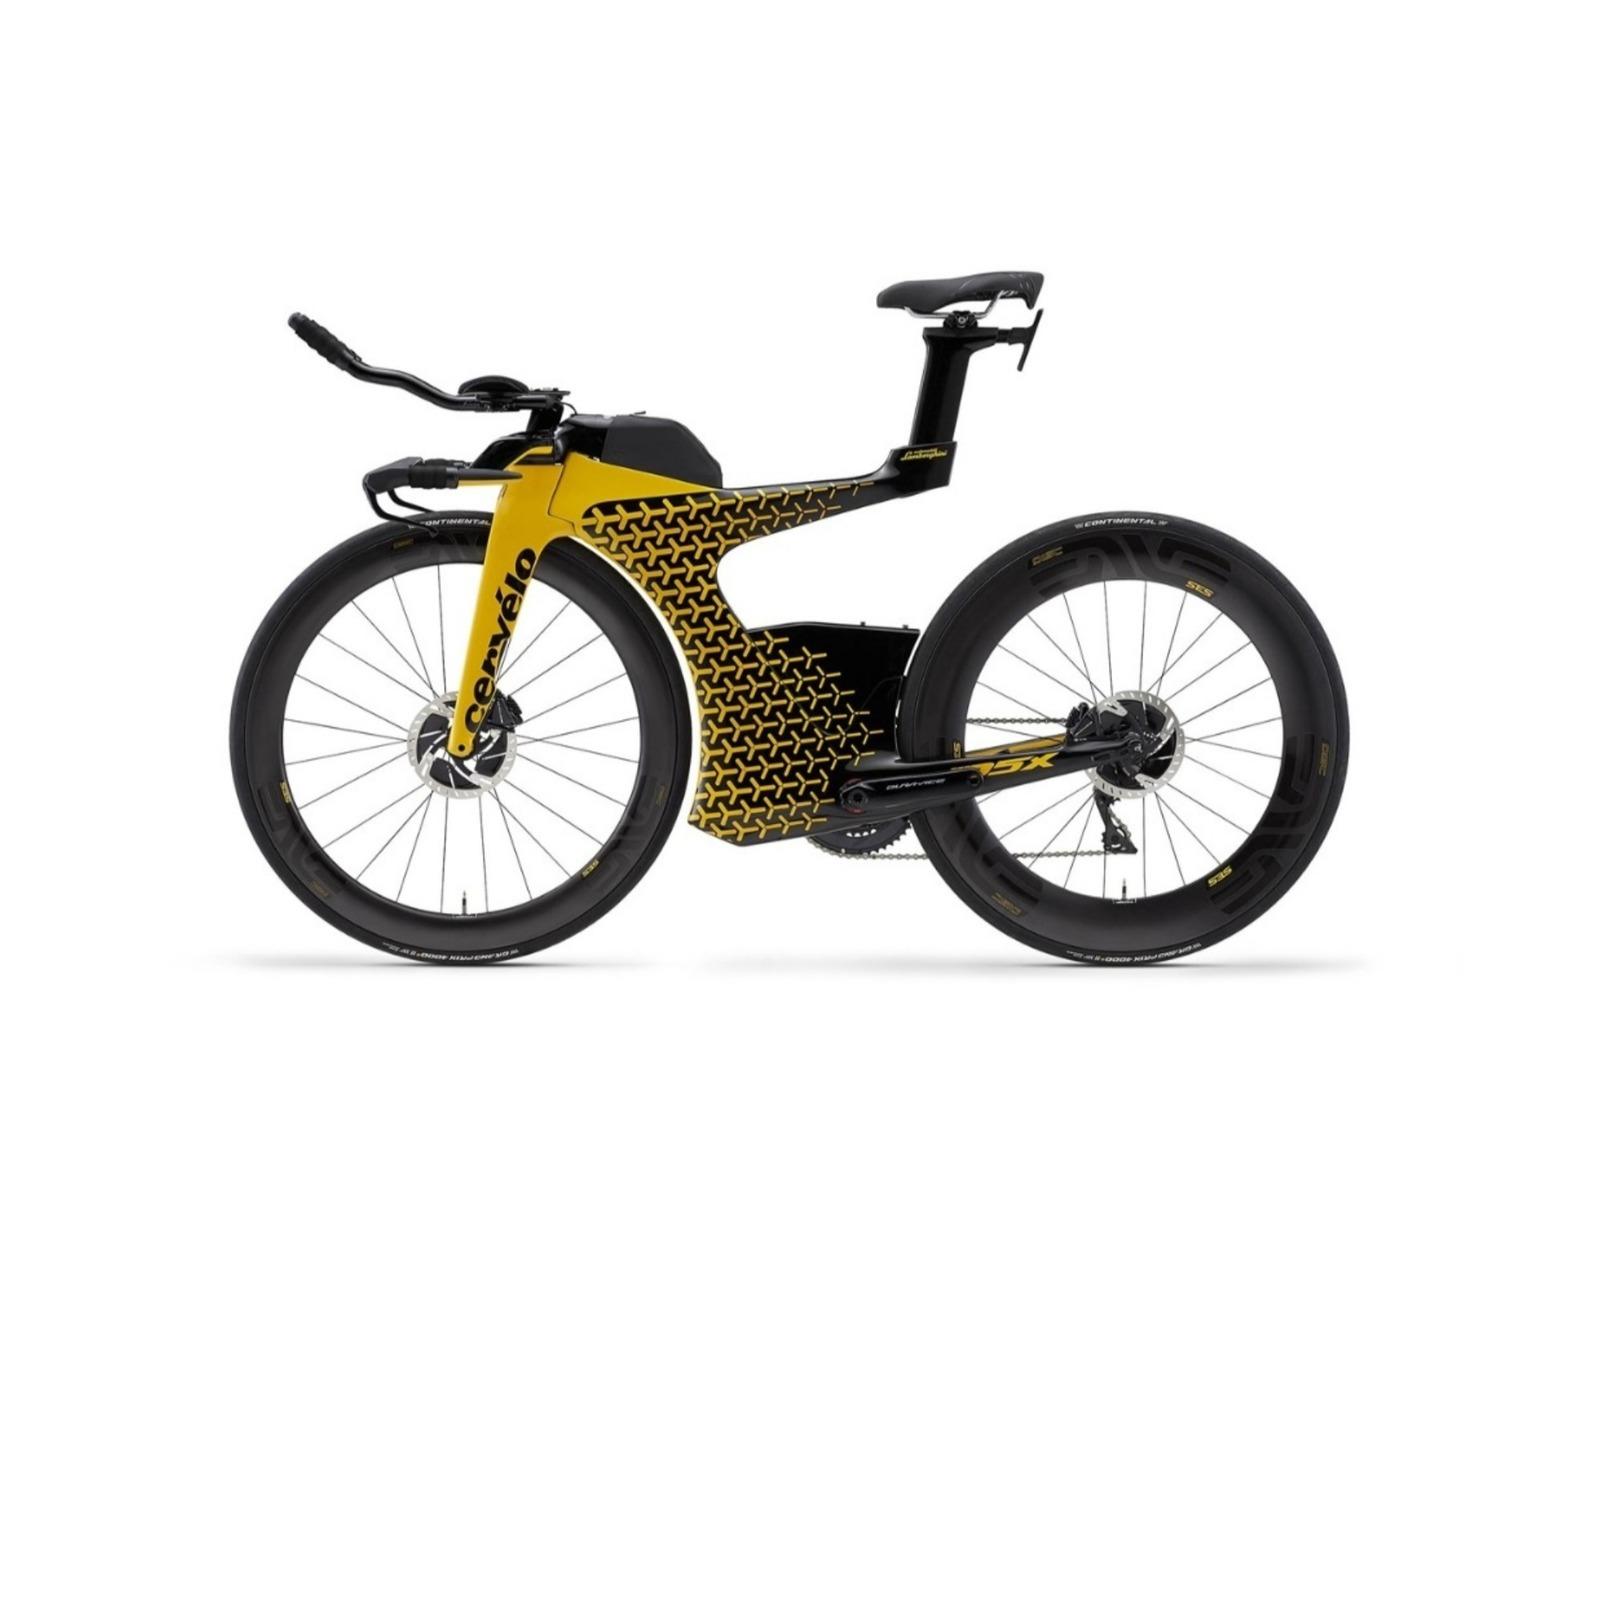 bike angular lamborghini velonia with inspired gt lighter aluminum bikes sharper commuter the veloina seattube bicycles no viks city urban complete gets new